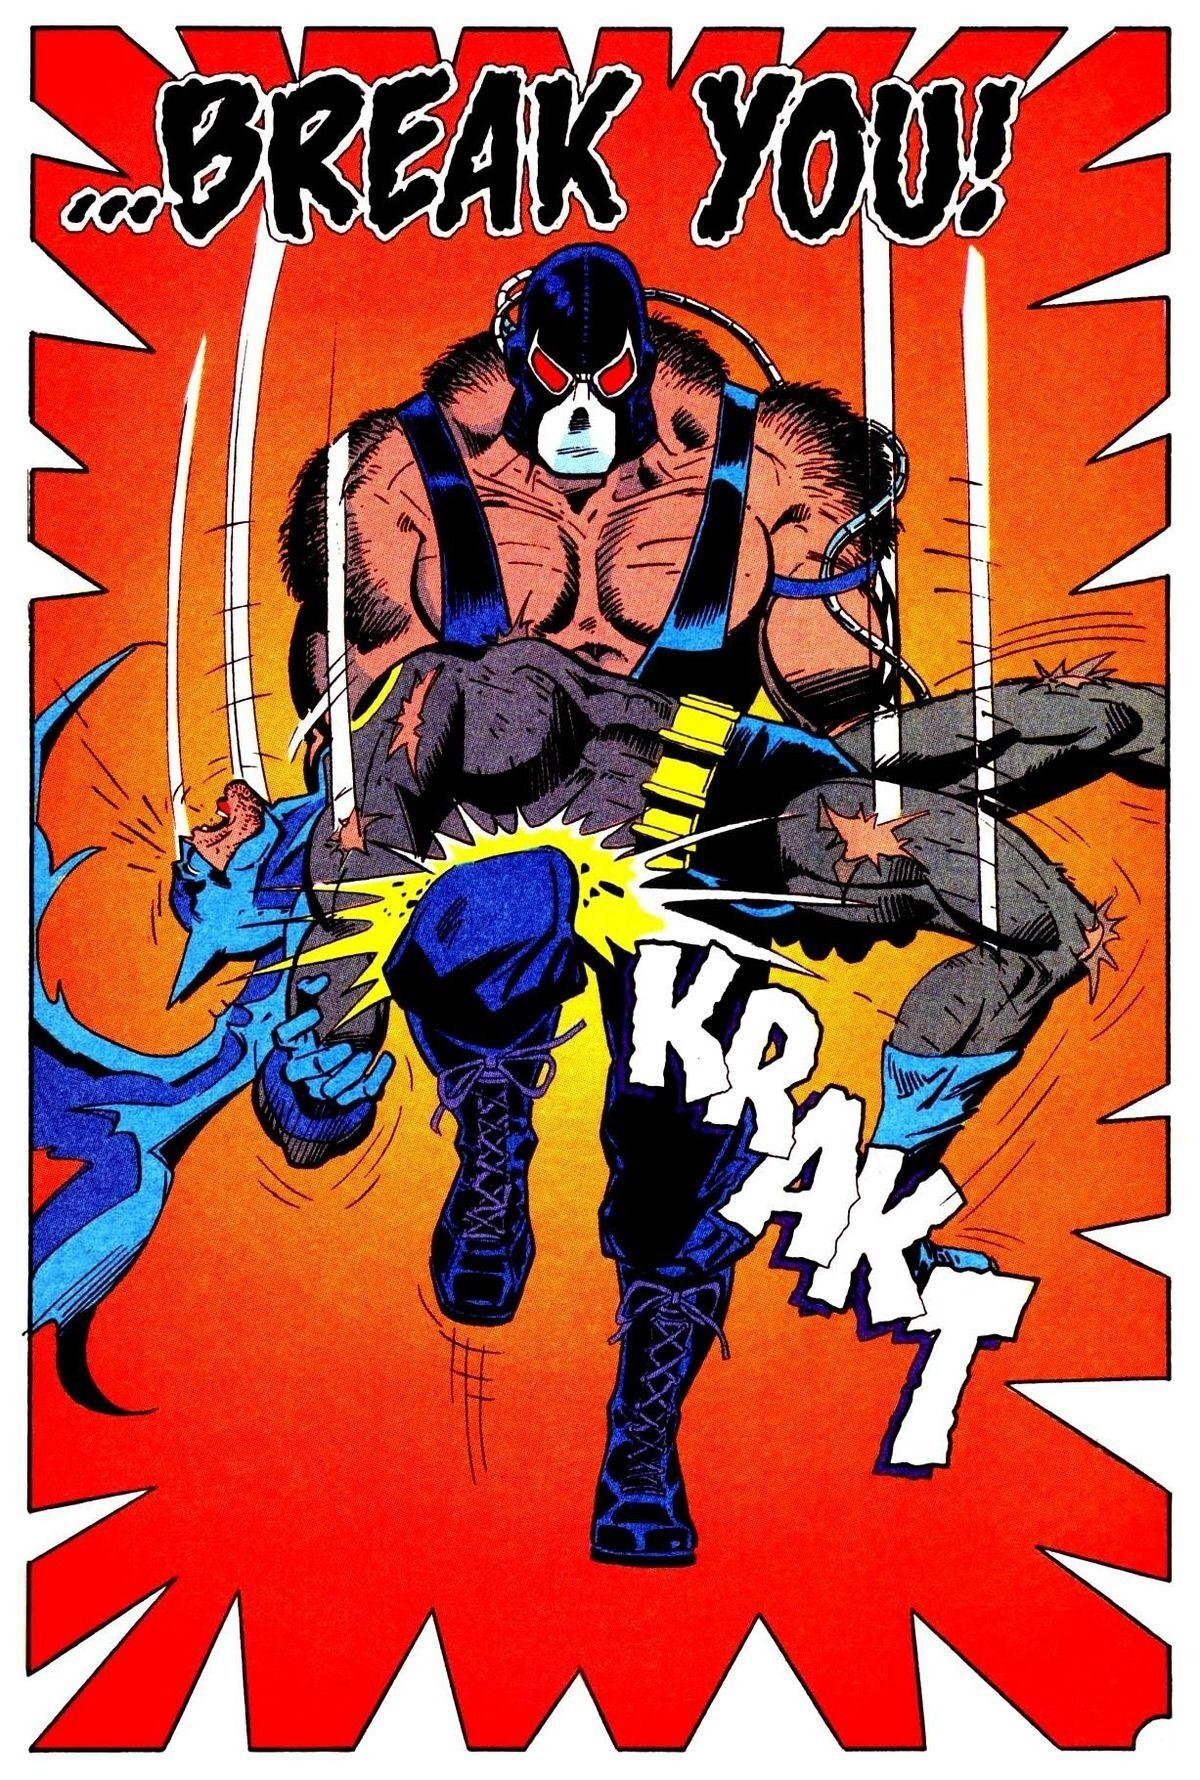 Bane rompiéndole la espalda a Batman/Bruce Wayne en Batman #497 (julio de 1993). Arte por Jim Aparo. Imagen: pinterest.com